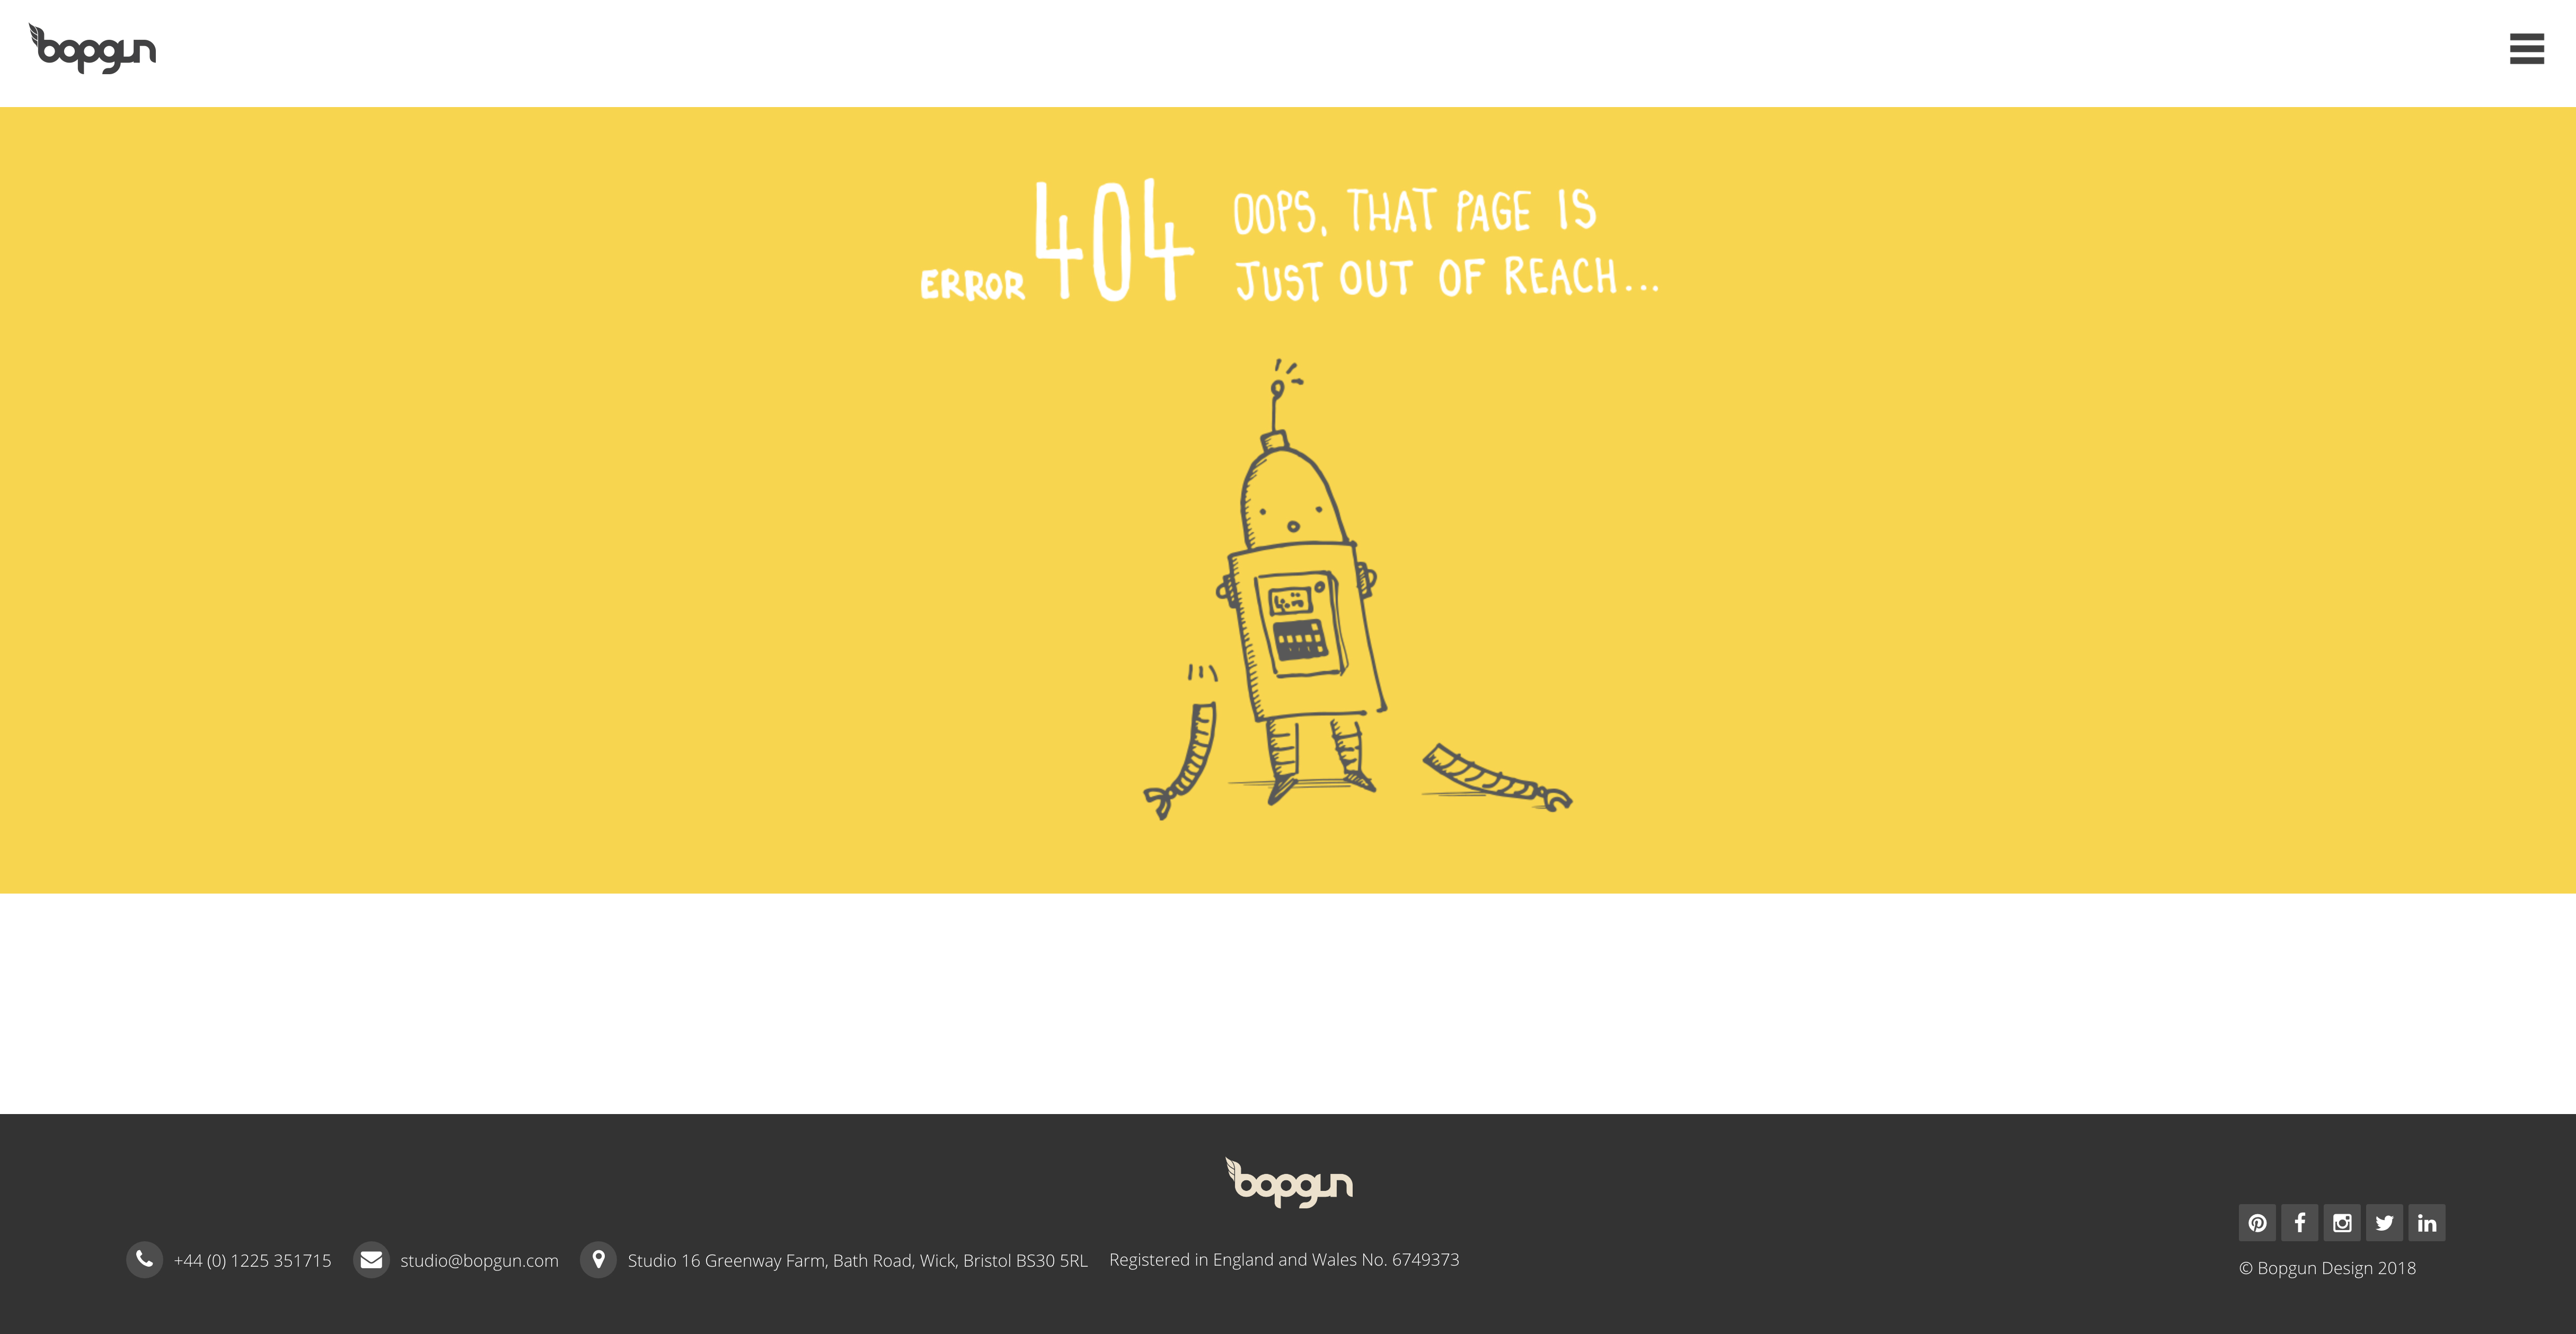 Bopgun 404